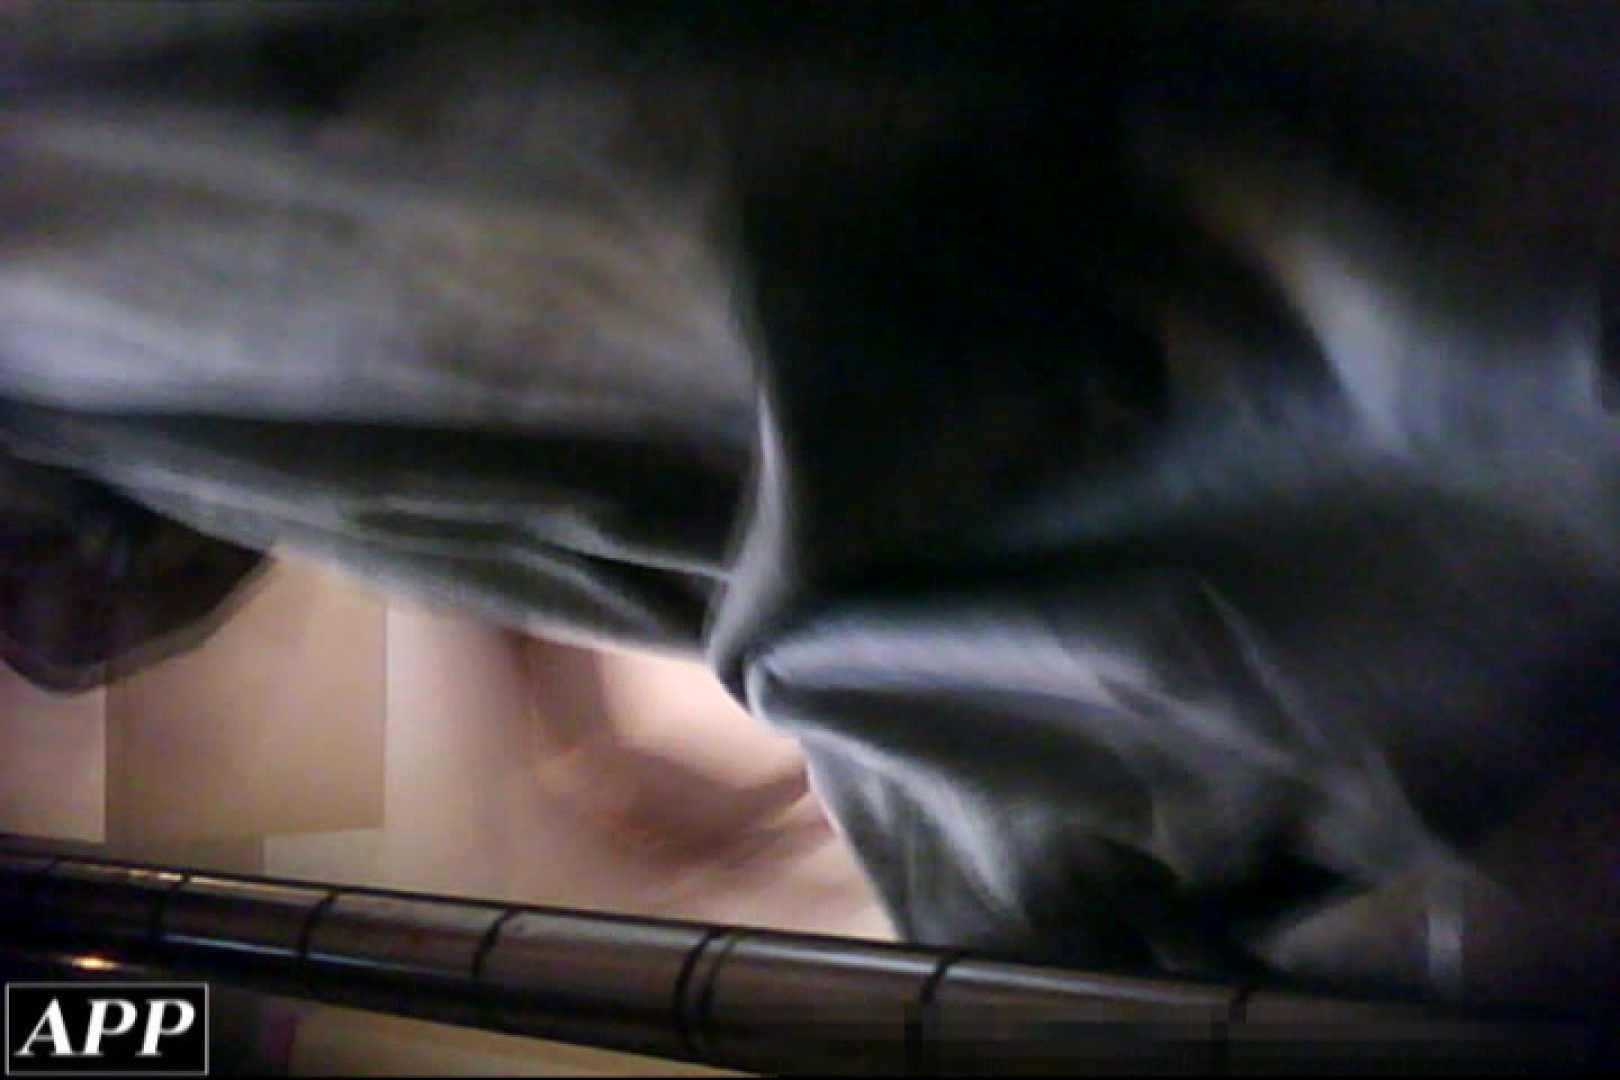 3視点洗面所 vol.98 肛門 | OLの実態  52pic 7